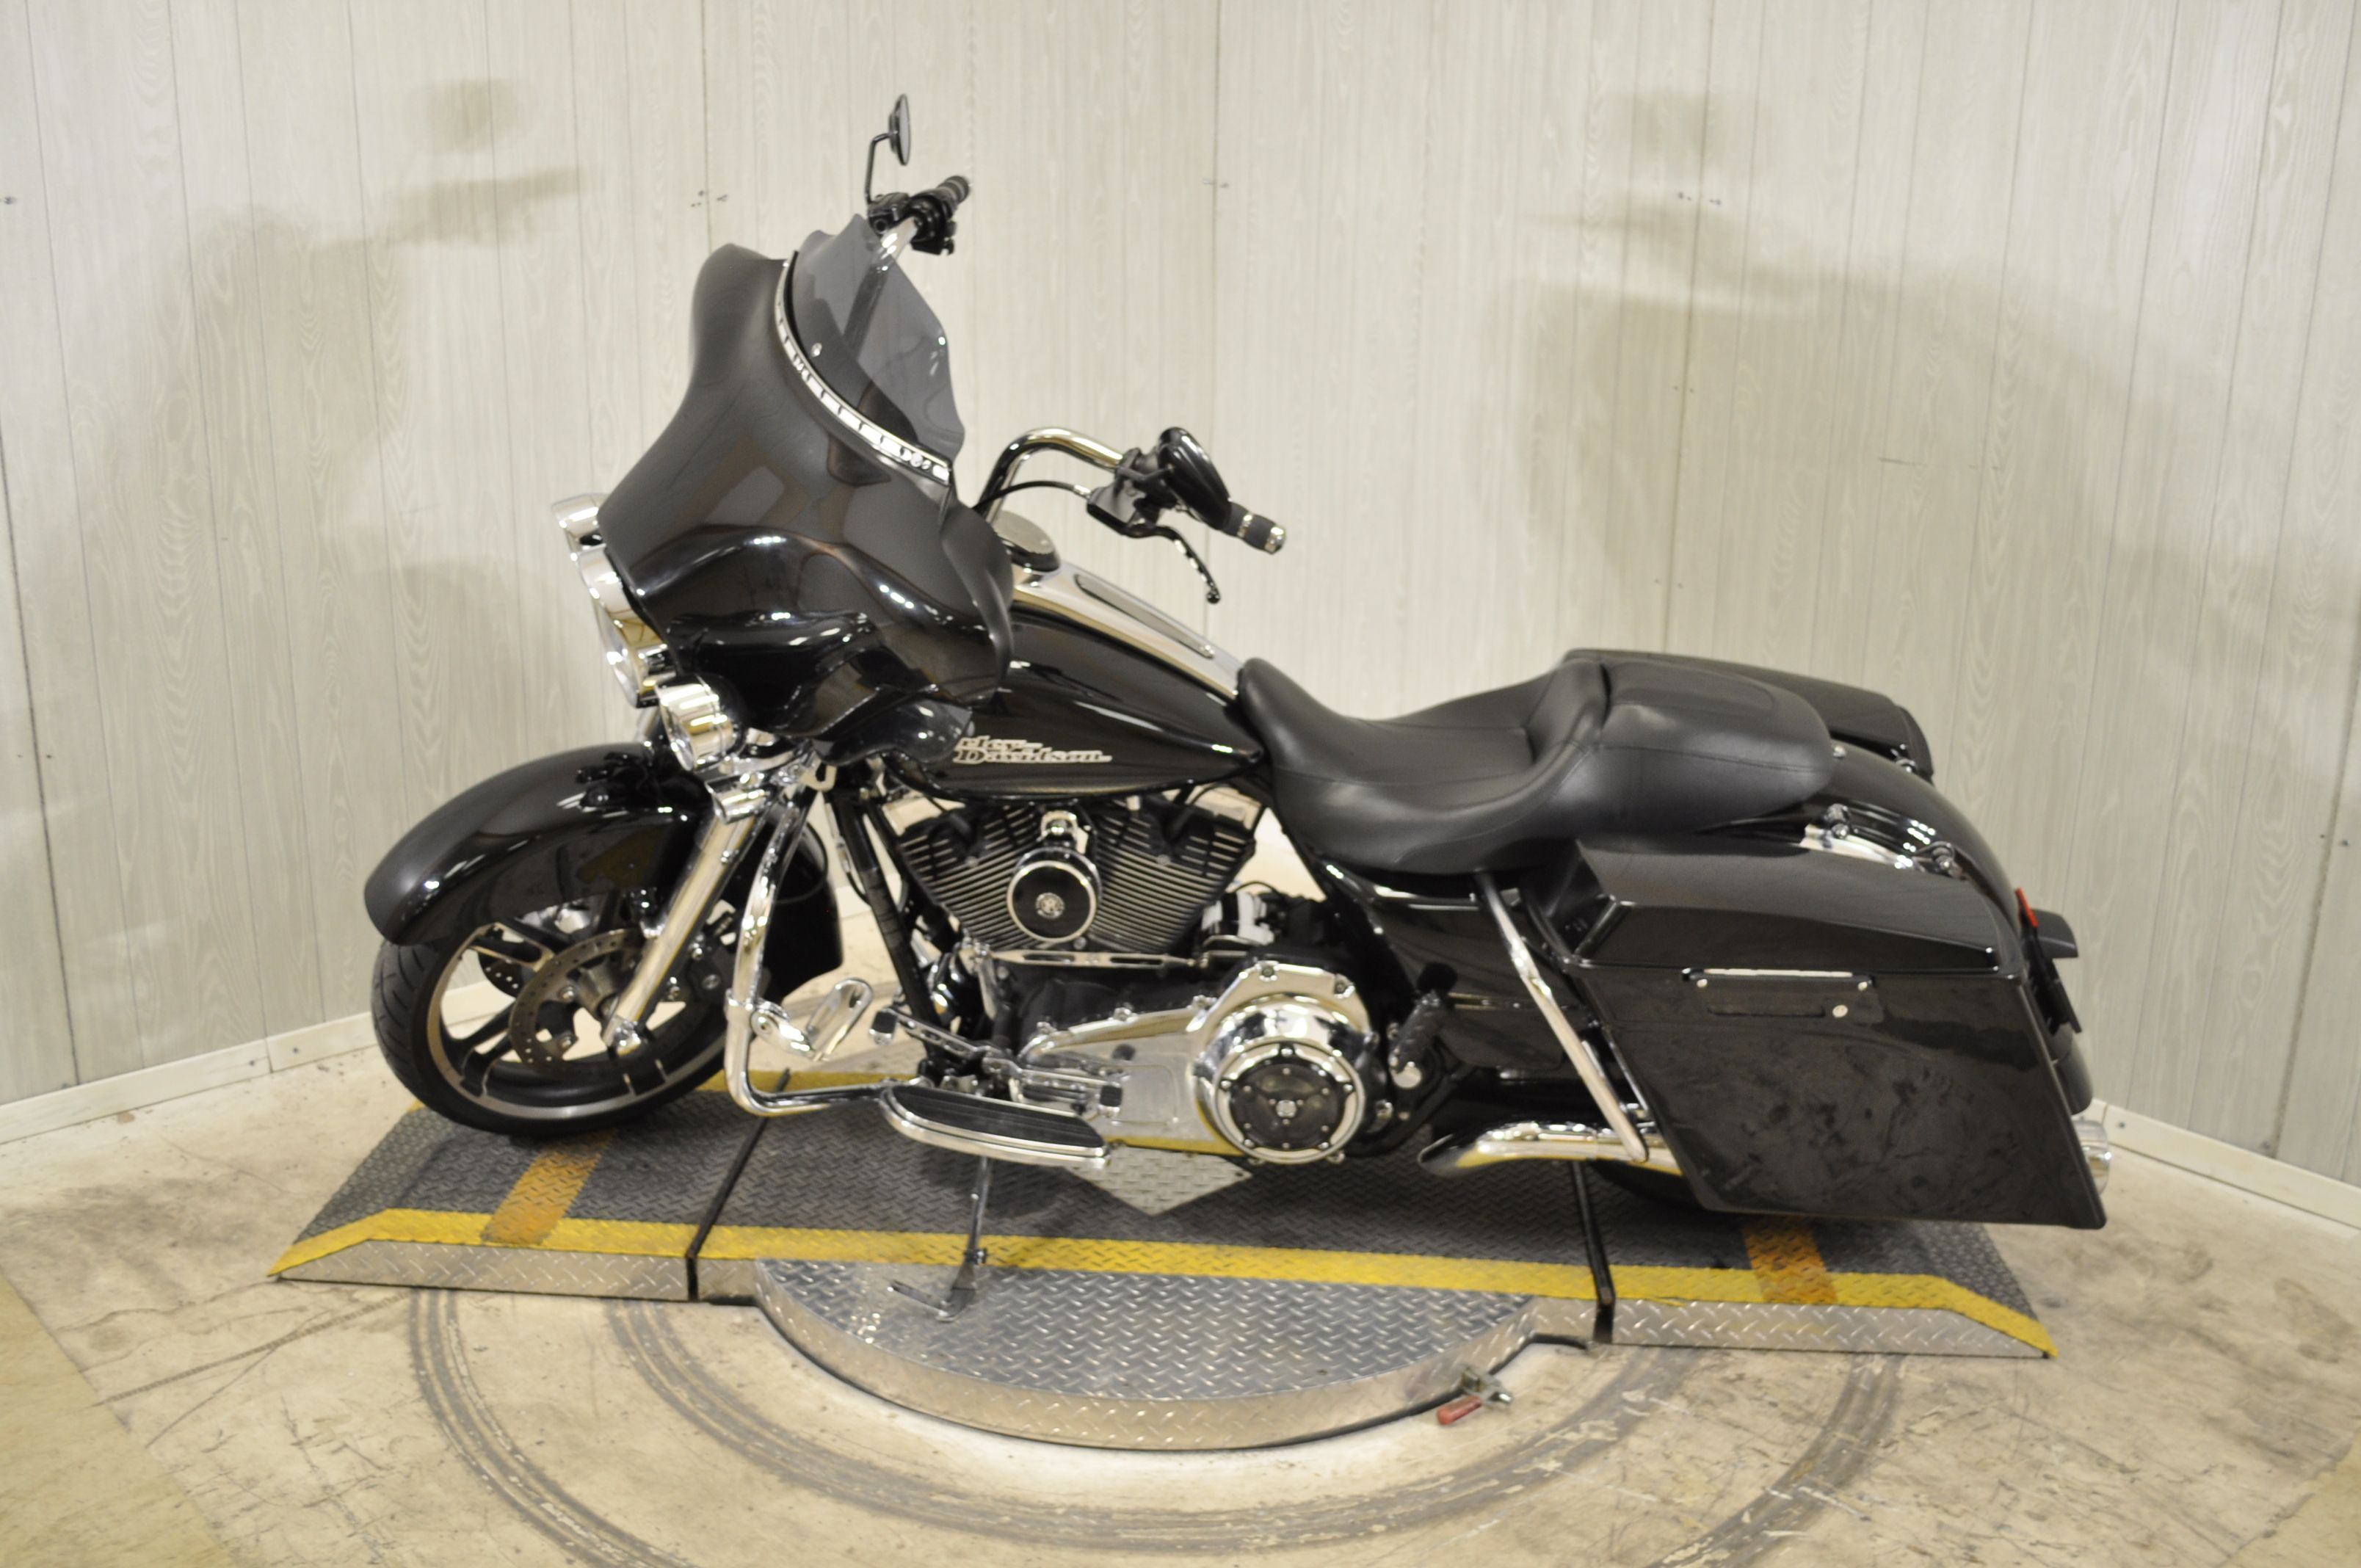 Pre-Owned 2010 Harley-Davidson Street Glide FLHX